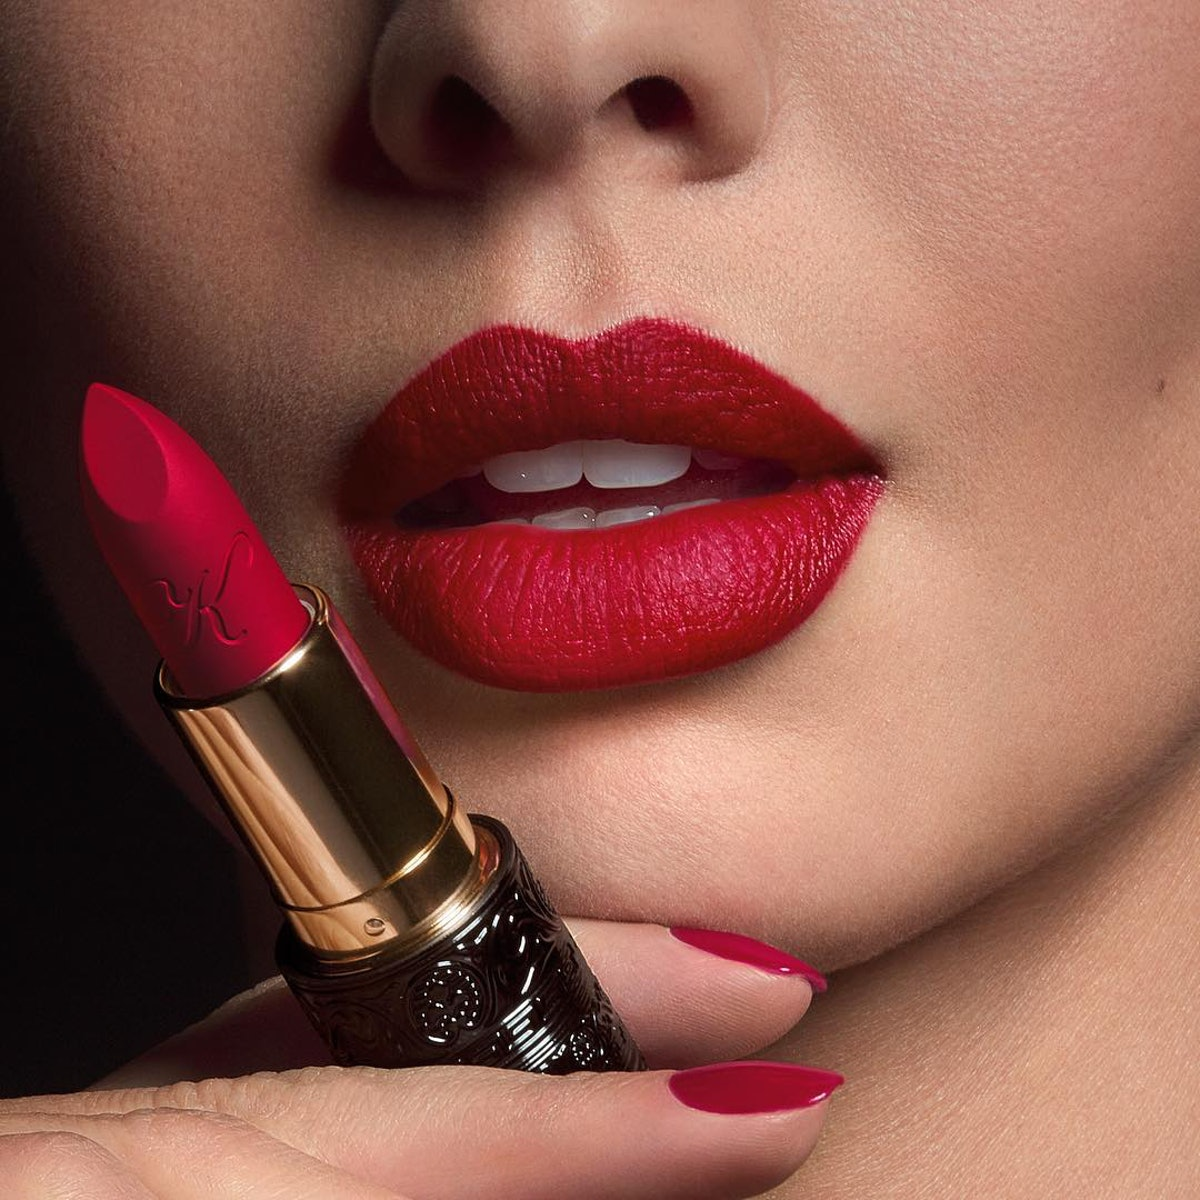 15 New Luxury Lipsticks That Your Lips Deserve